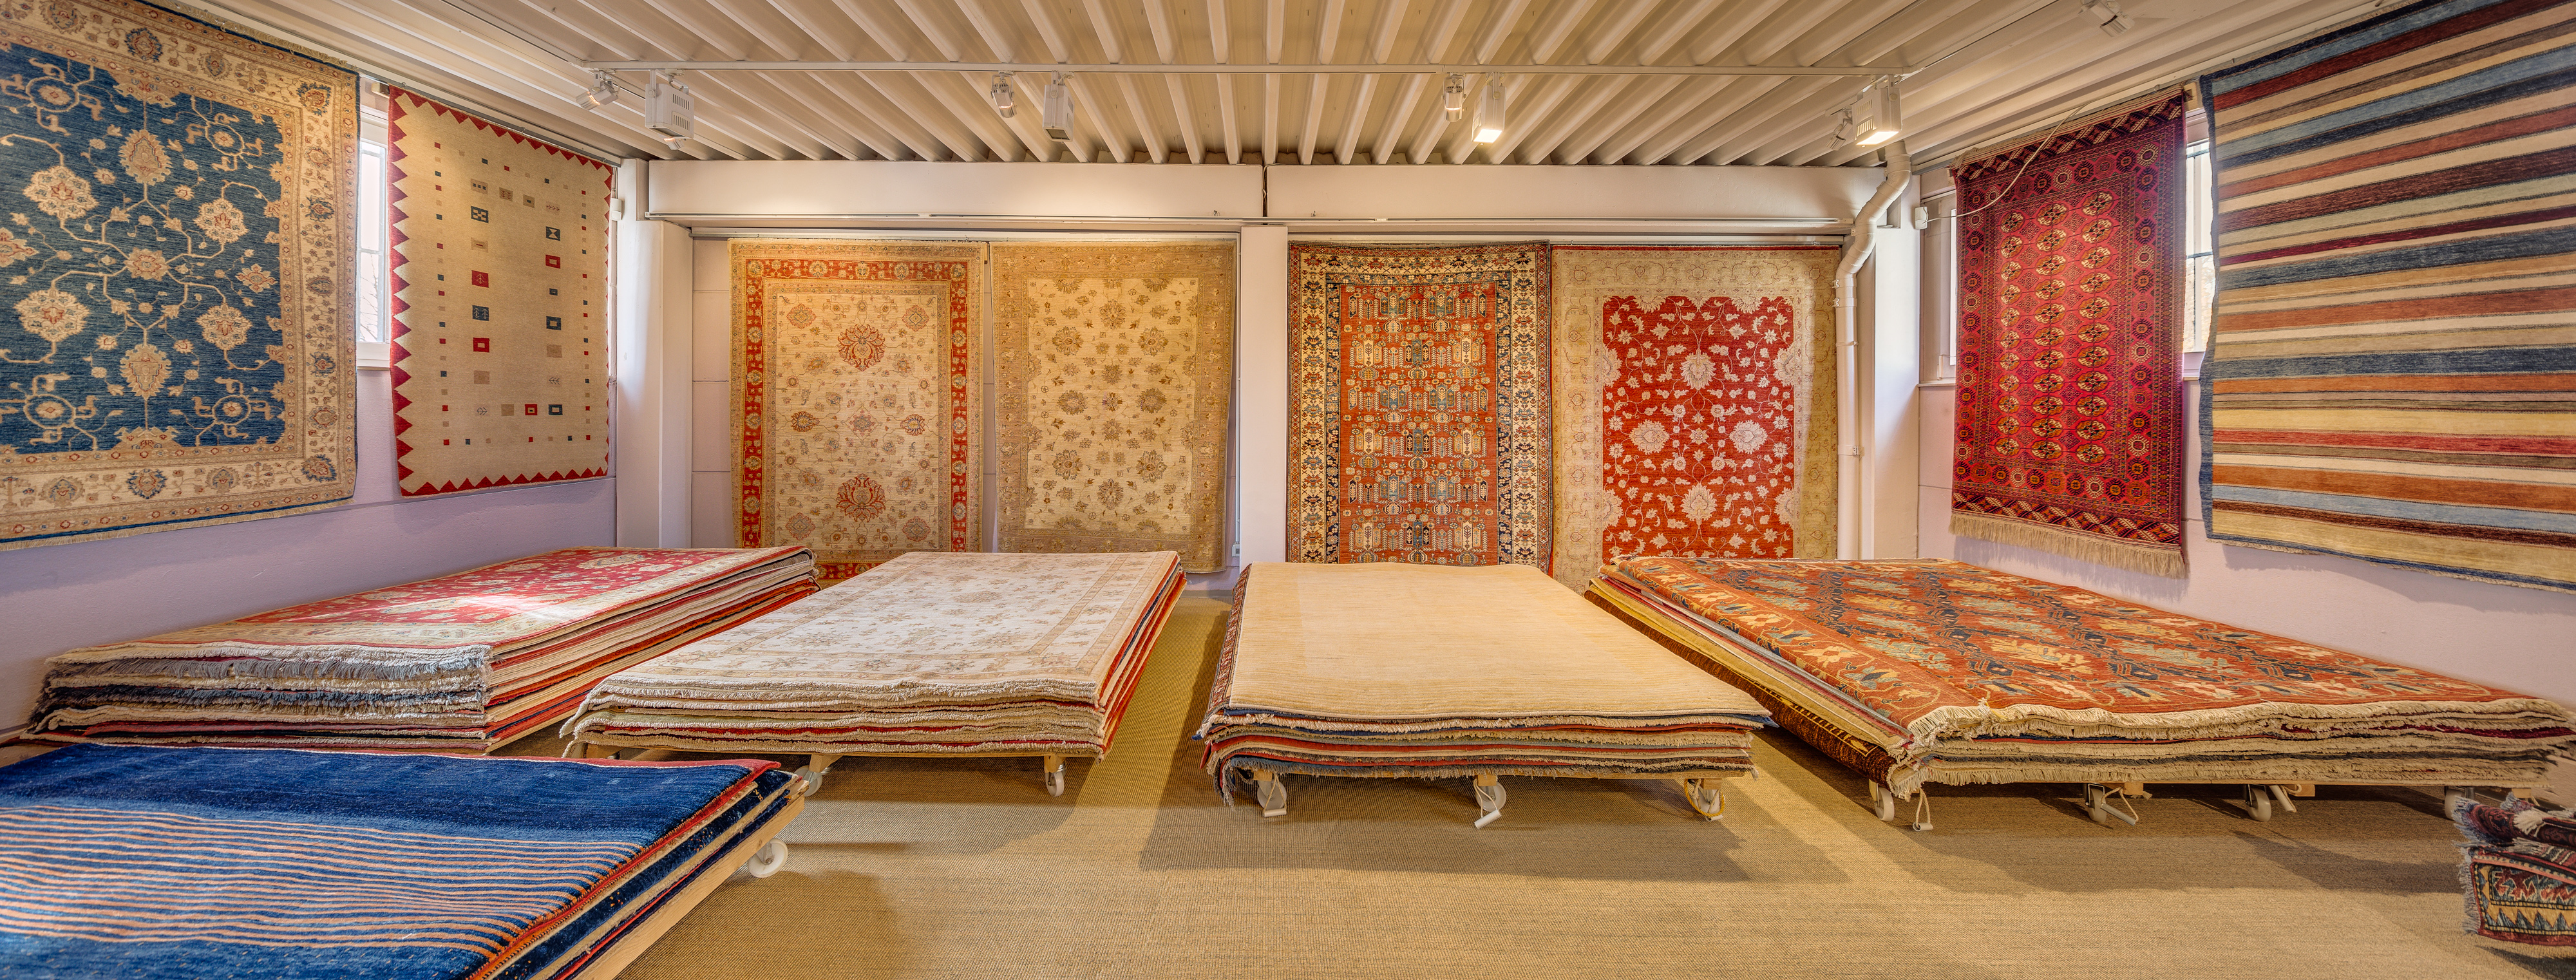 unser sortiment i teppichvielfalt i orientteppich palais 1001 nacht. Black Bedroom Furniture Sets. Home Design Ideas